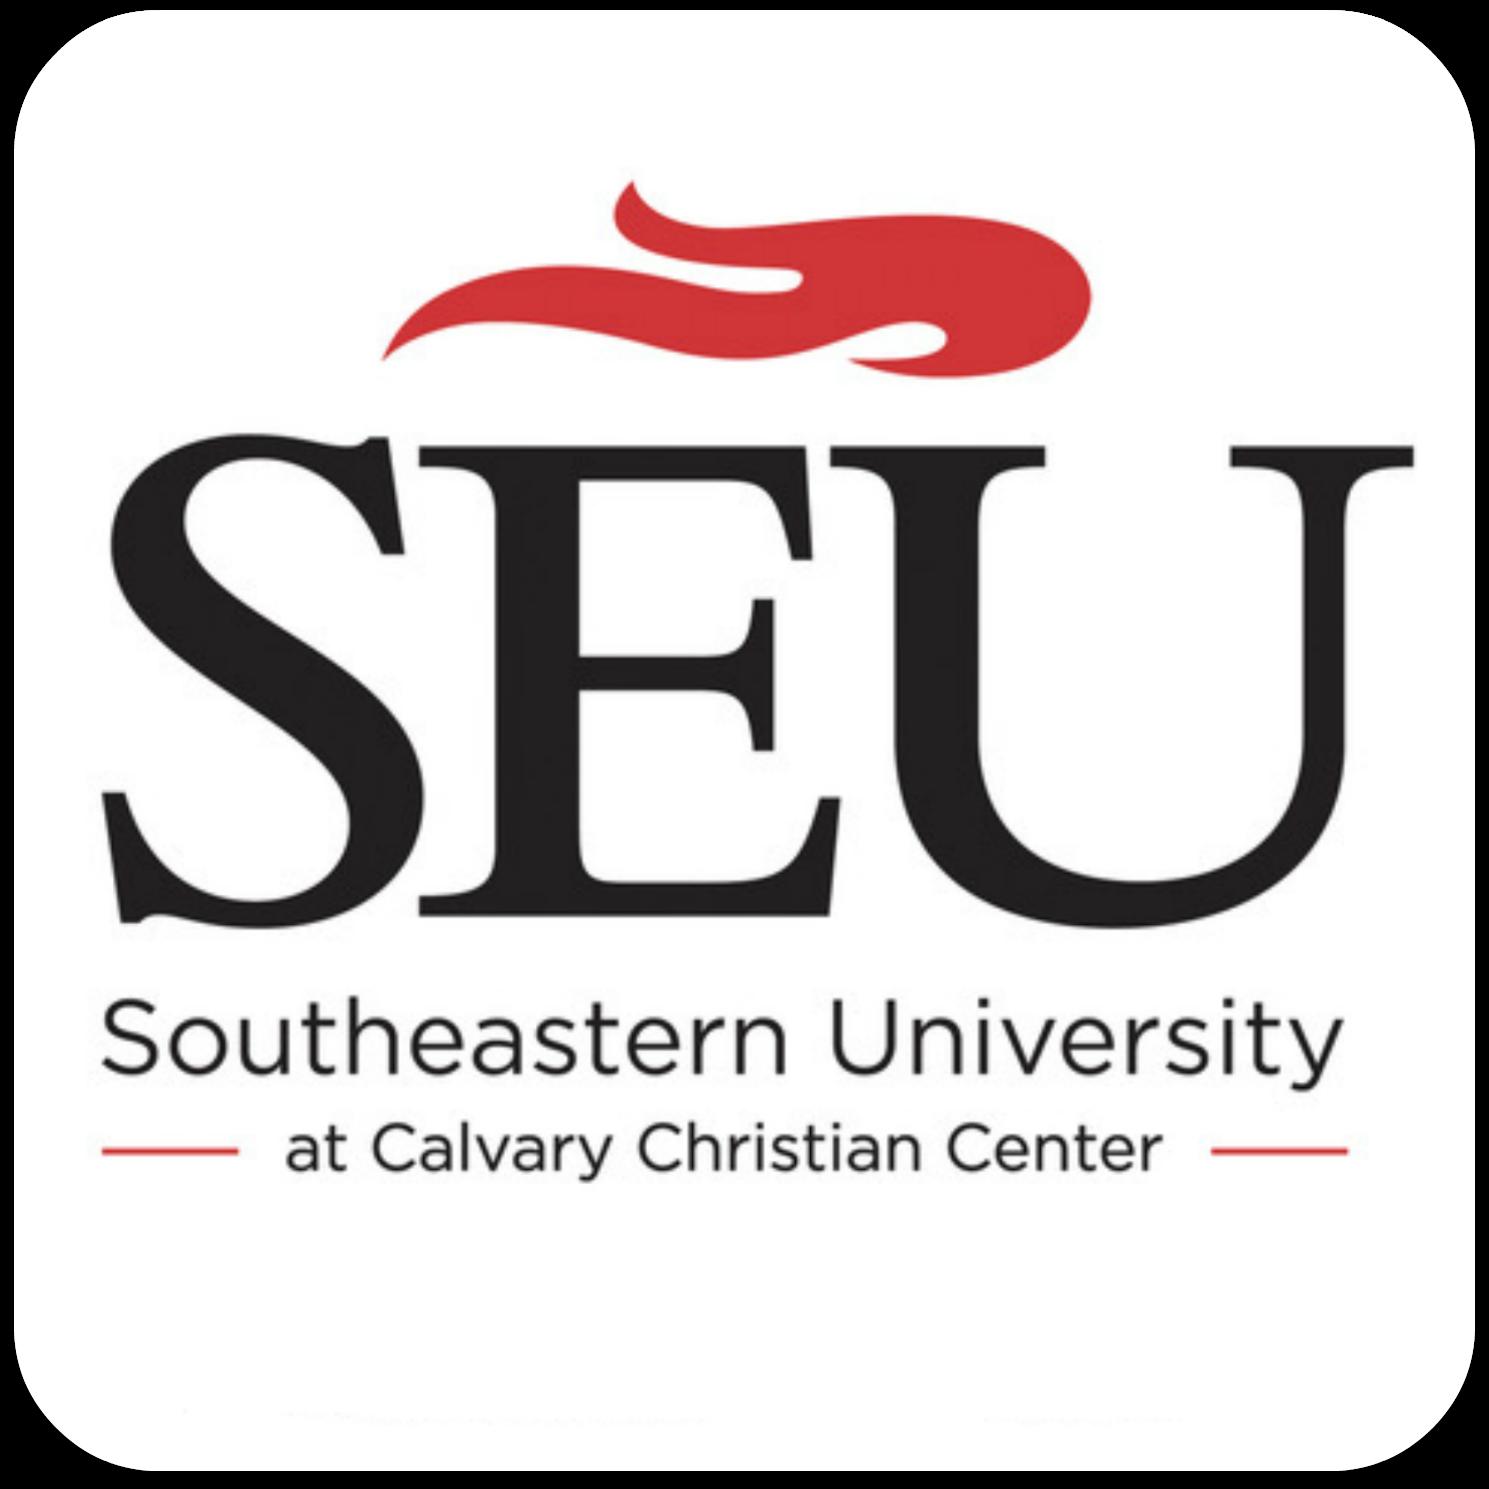 Southeastern University  at Calvary Christian Center